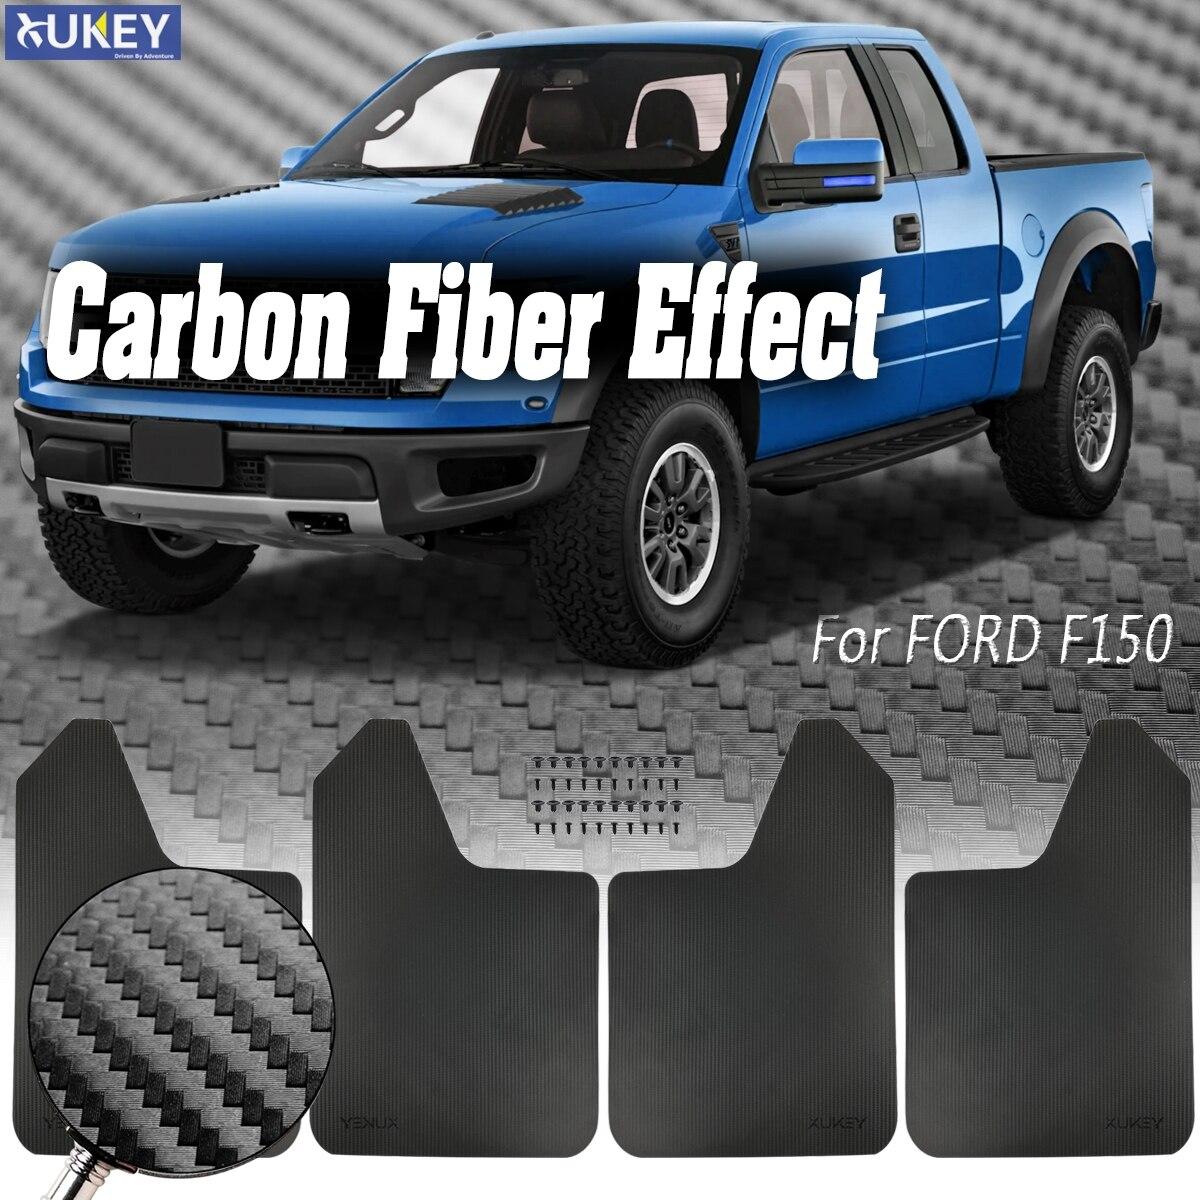 4 piezas guardabarros guardapolvos guardabarros delantero trasero para Ford F150 F250 Raptor Ranger T6 MK1 MK2 XLT PX Everest BT-50